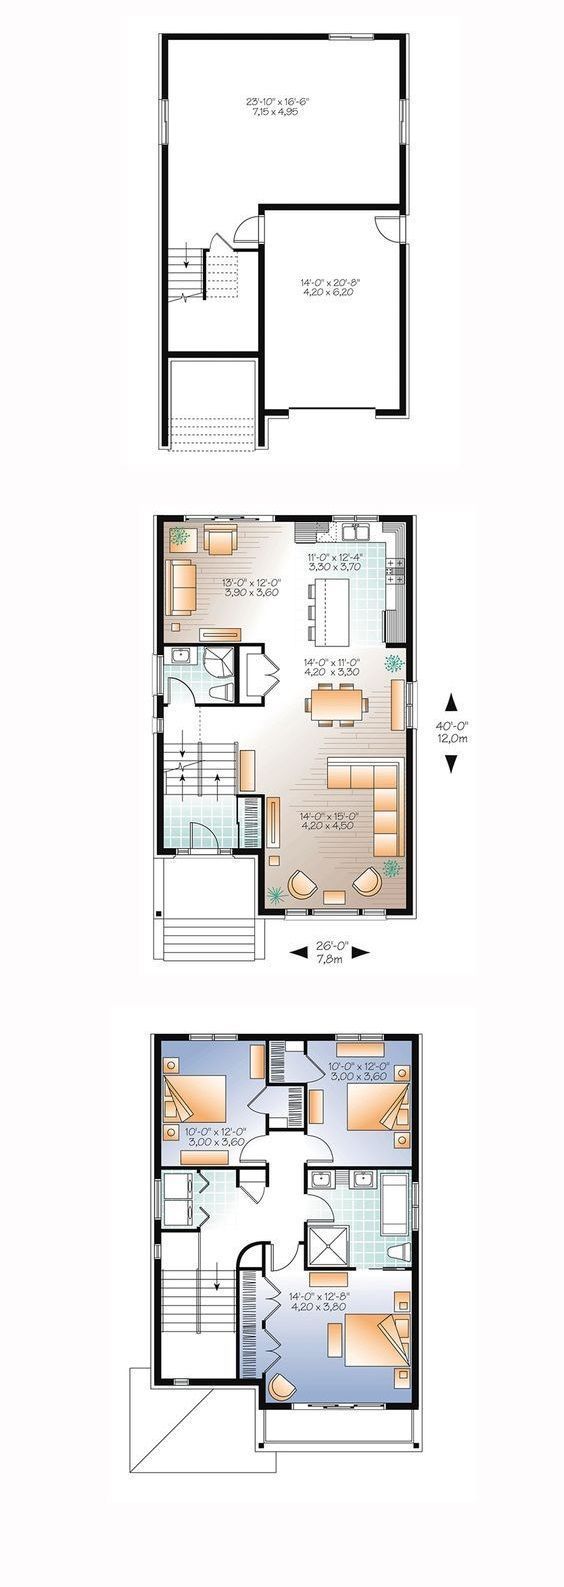 House Plans 8x12m House Plans Free Downloads House Layout Plans House Plans Home Design Plan